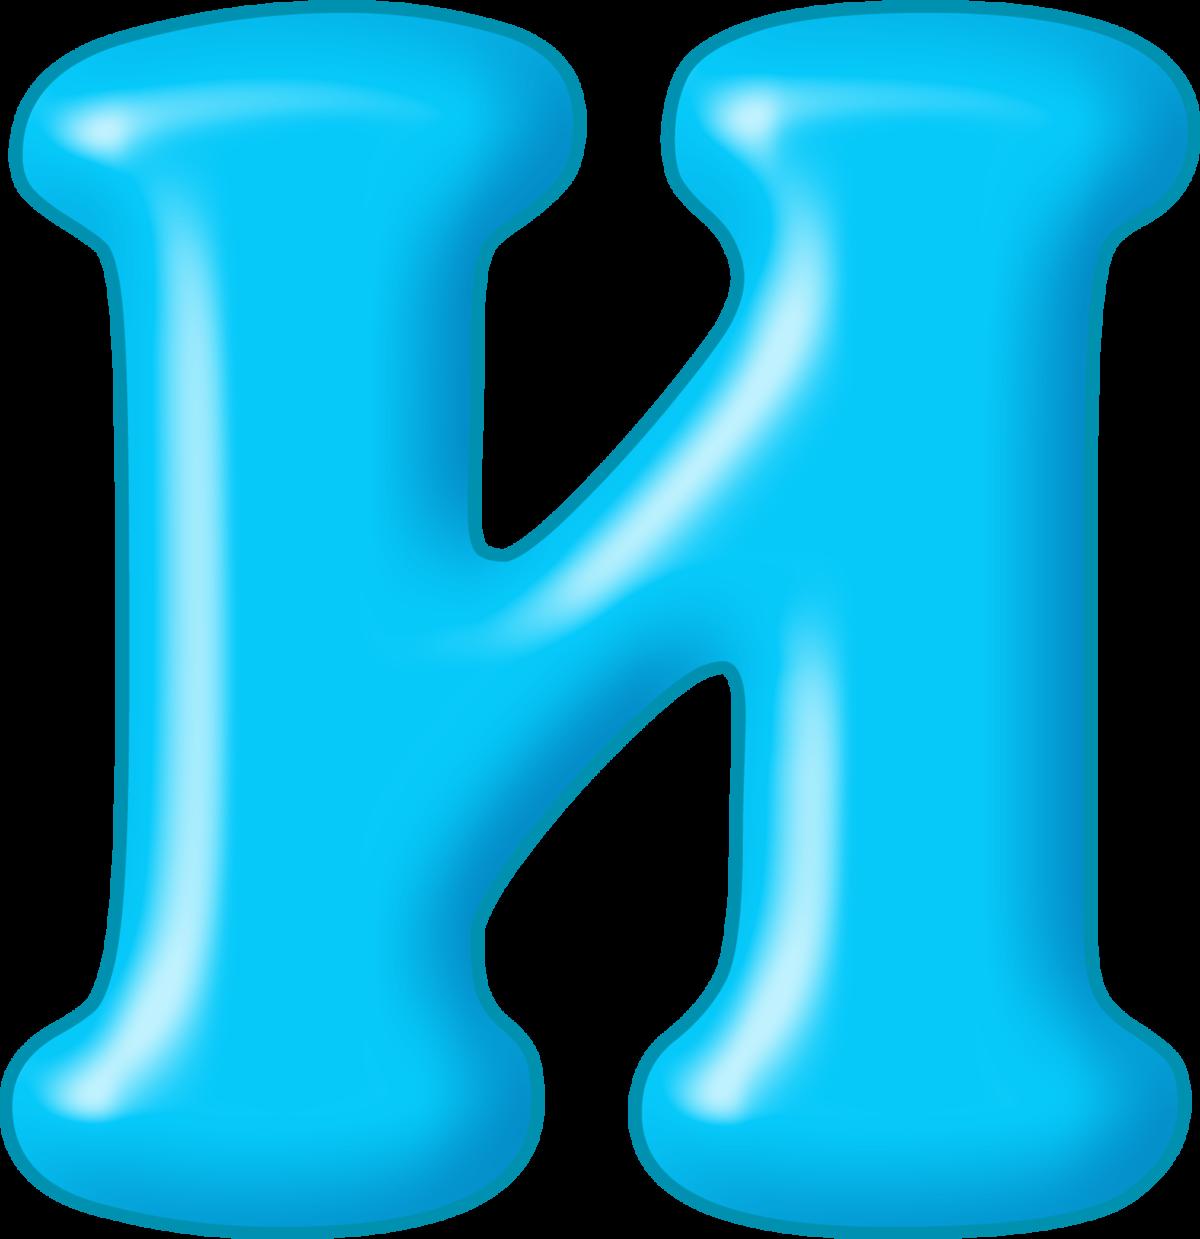 Картинки буквы на прозрачном фоне